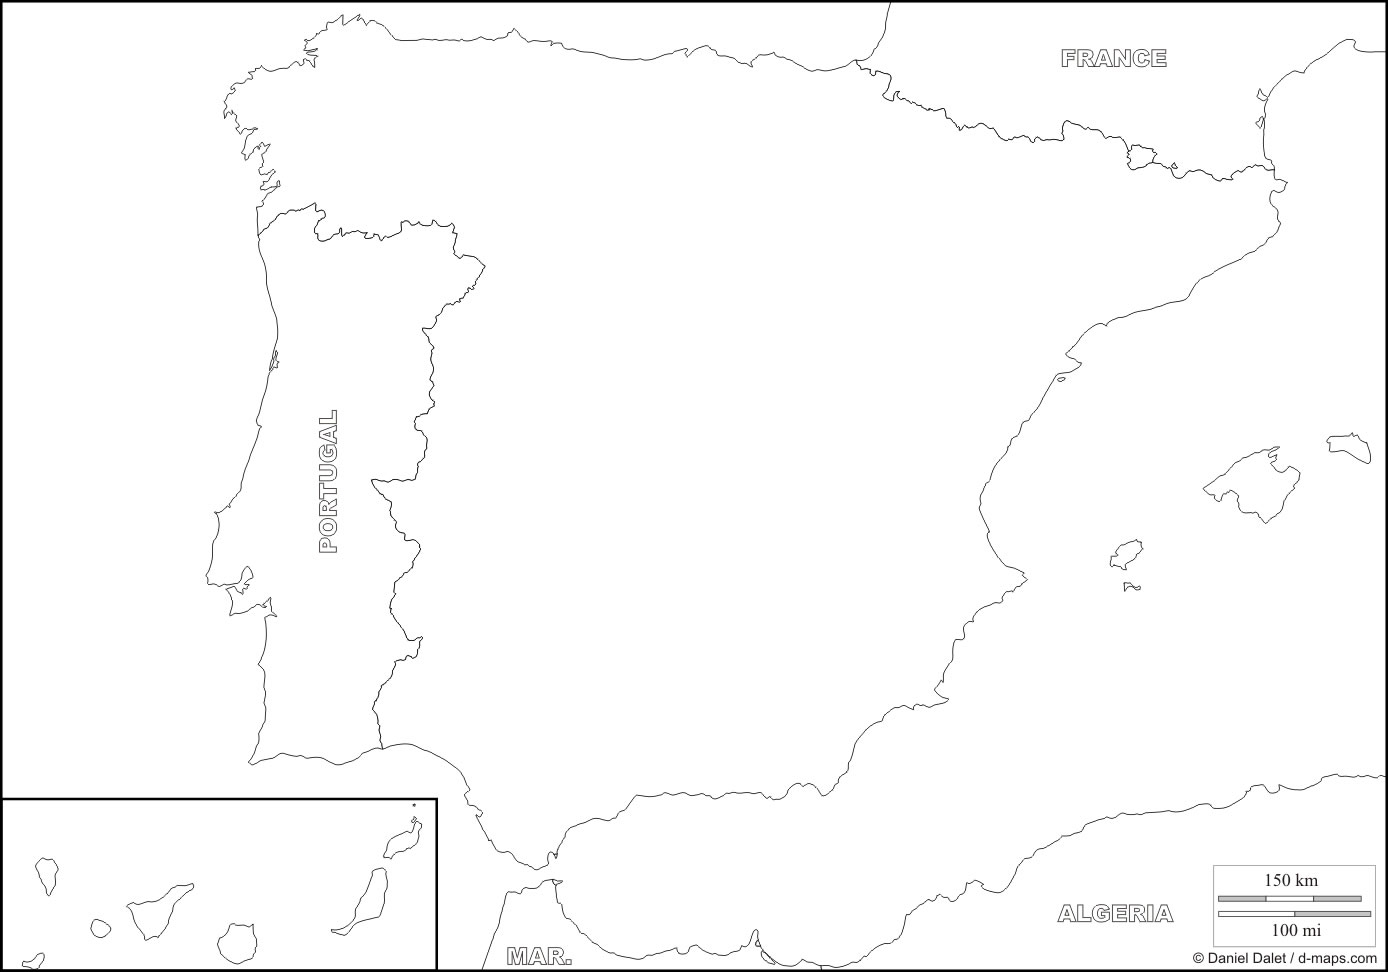 Carte Espagne Vierge, Carte Vierge De L'espagne destiné Carte De France A Remplir